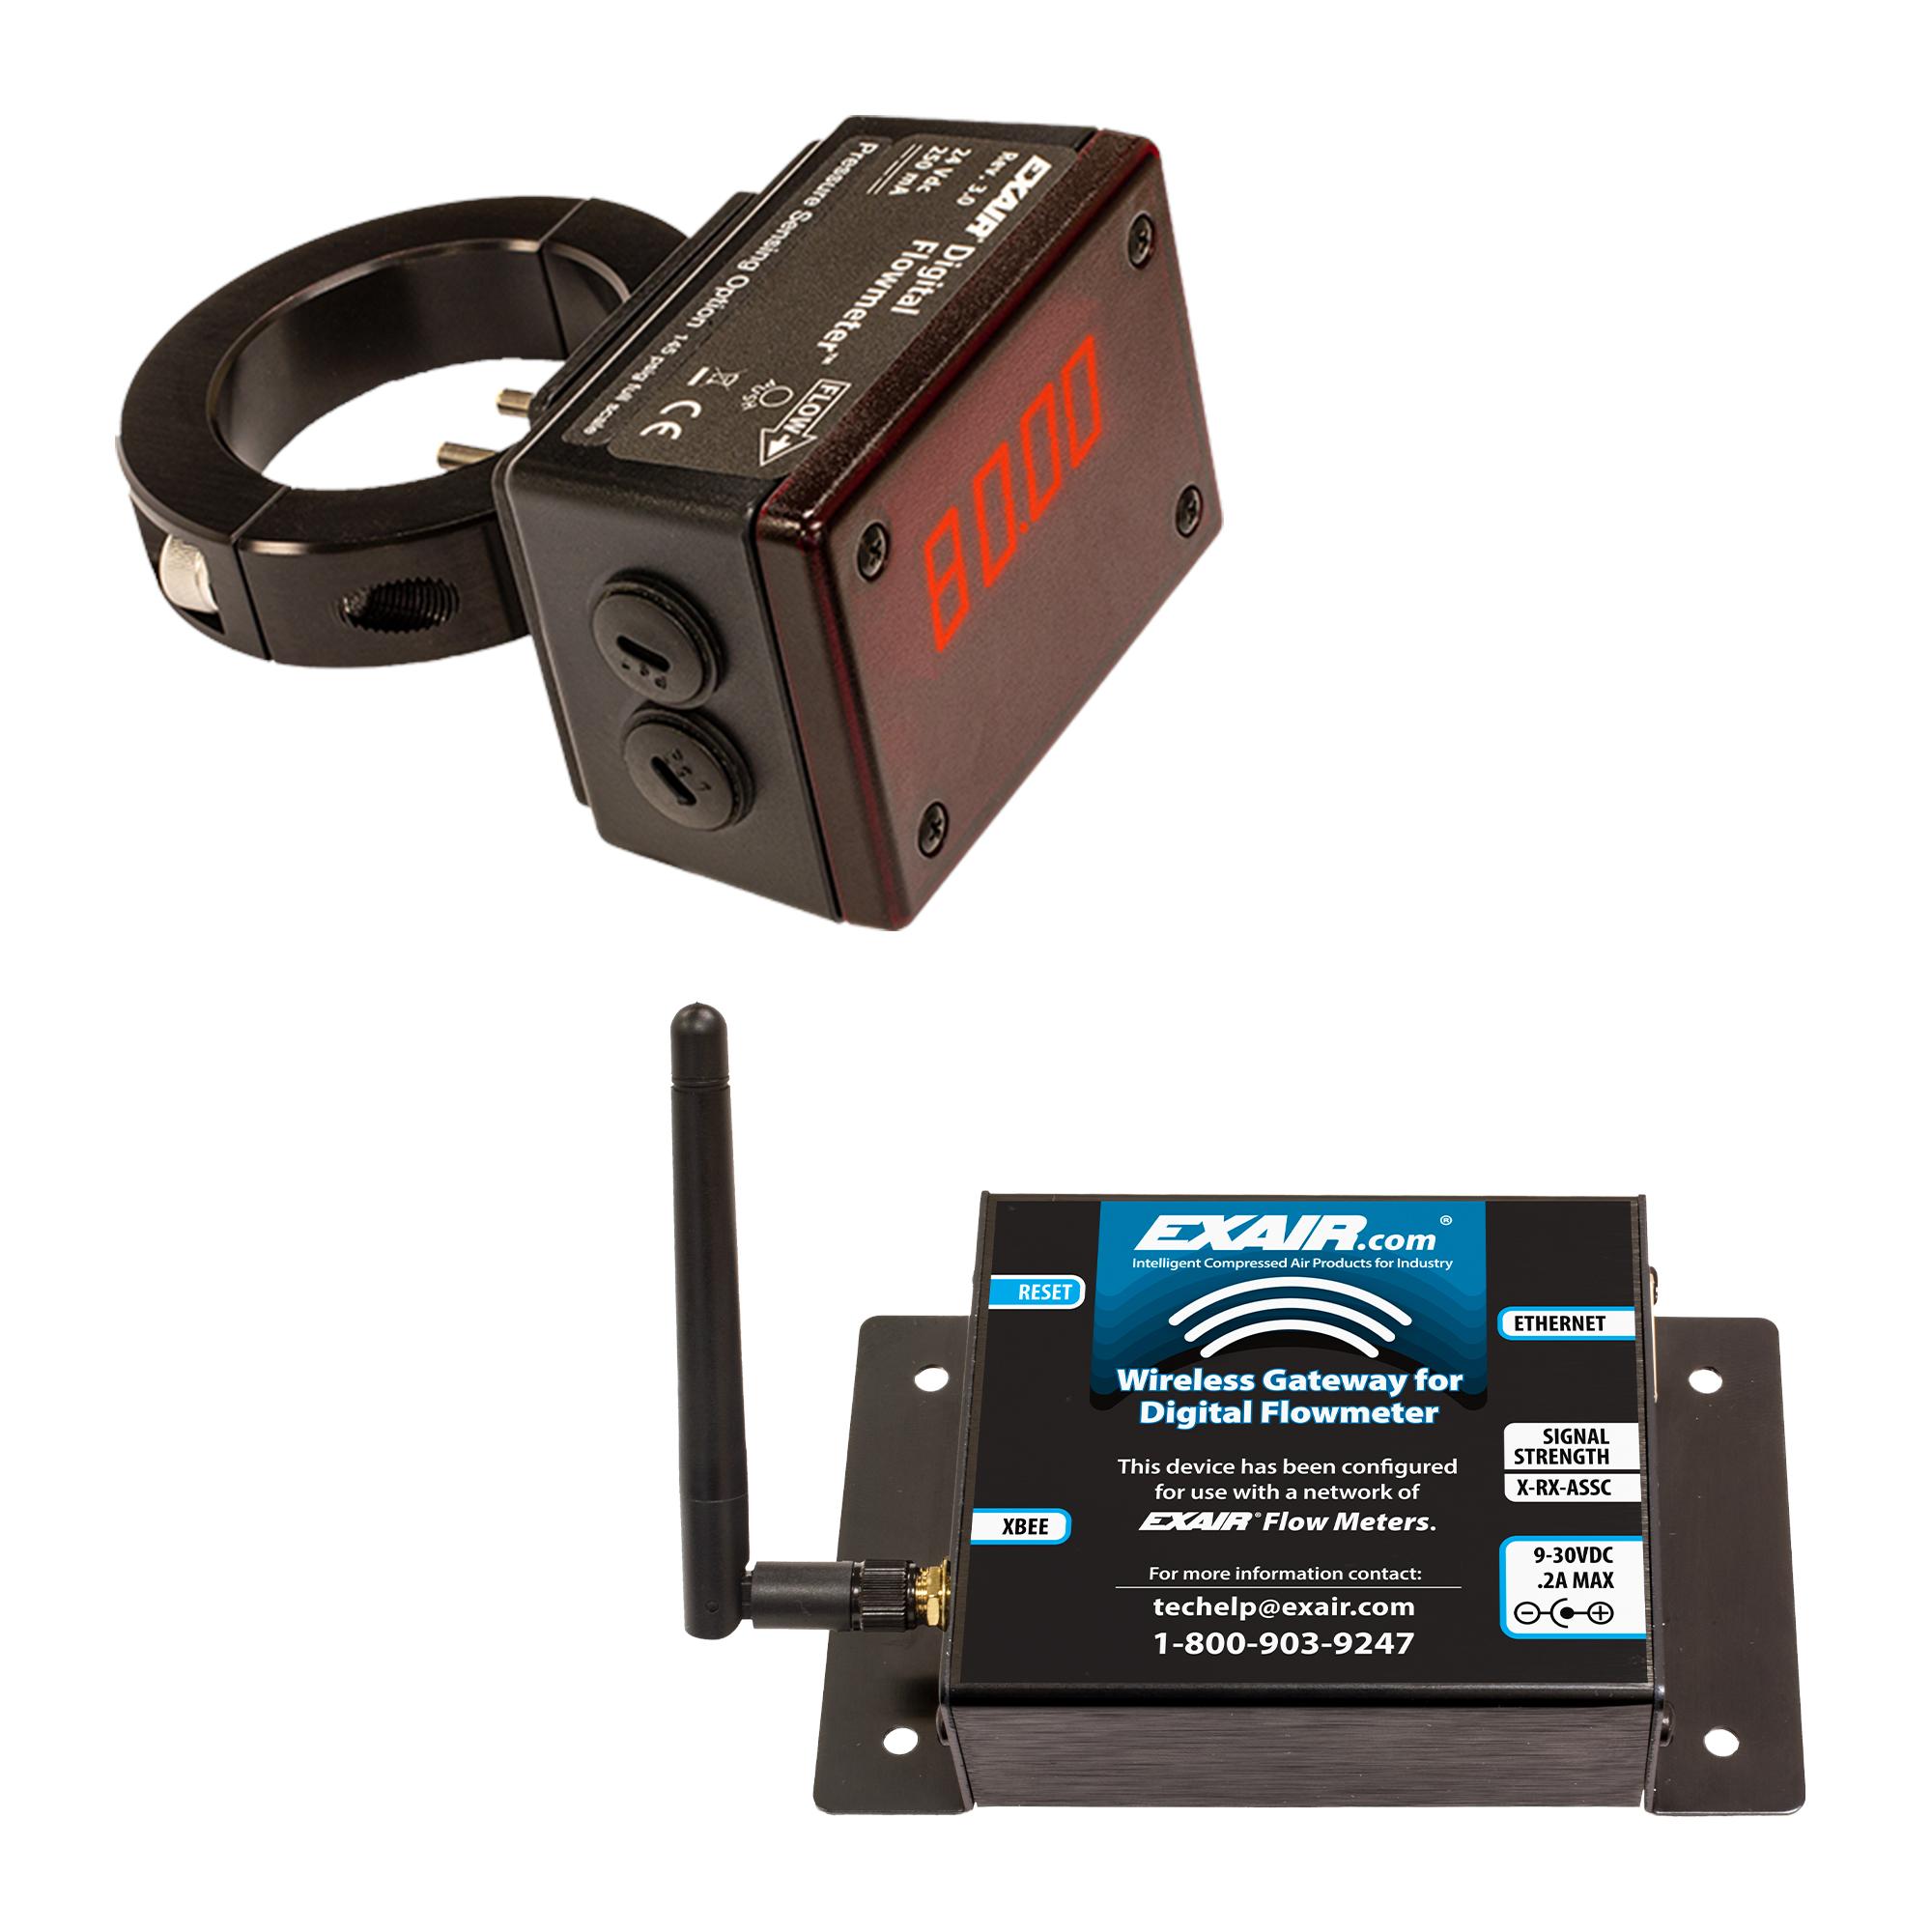 Pressure Sensing Digital Flowmeter and Wireless Gateway